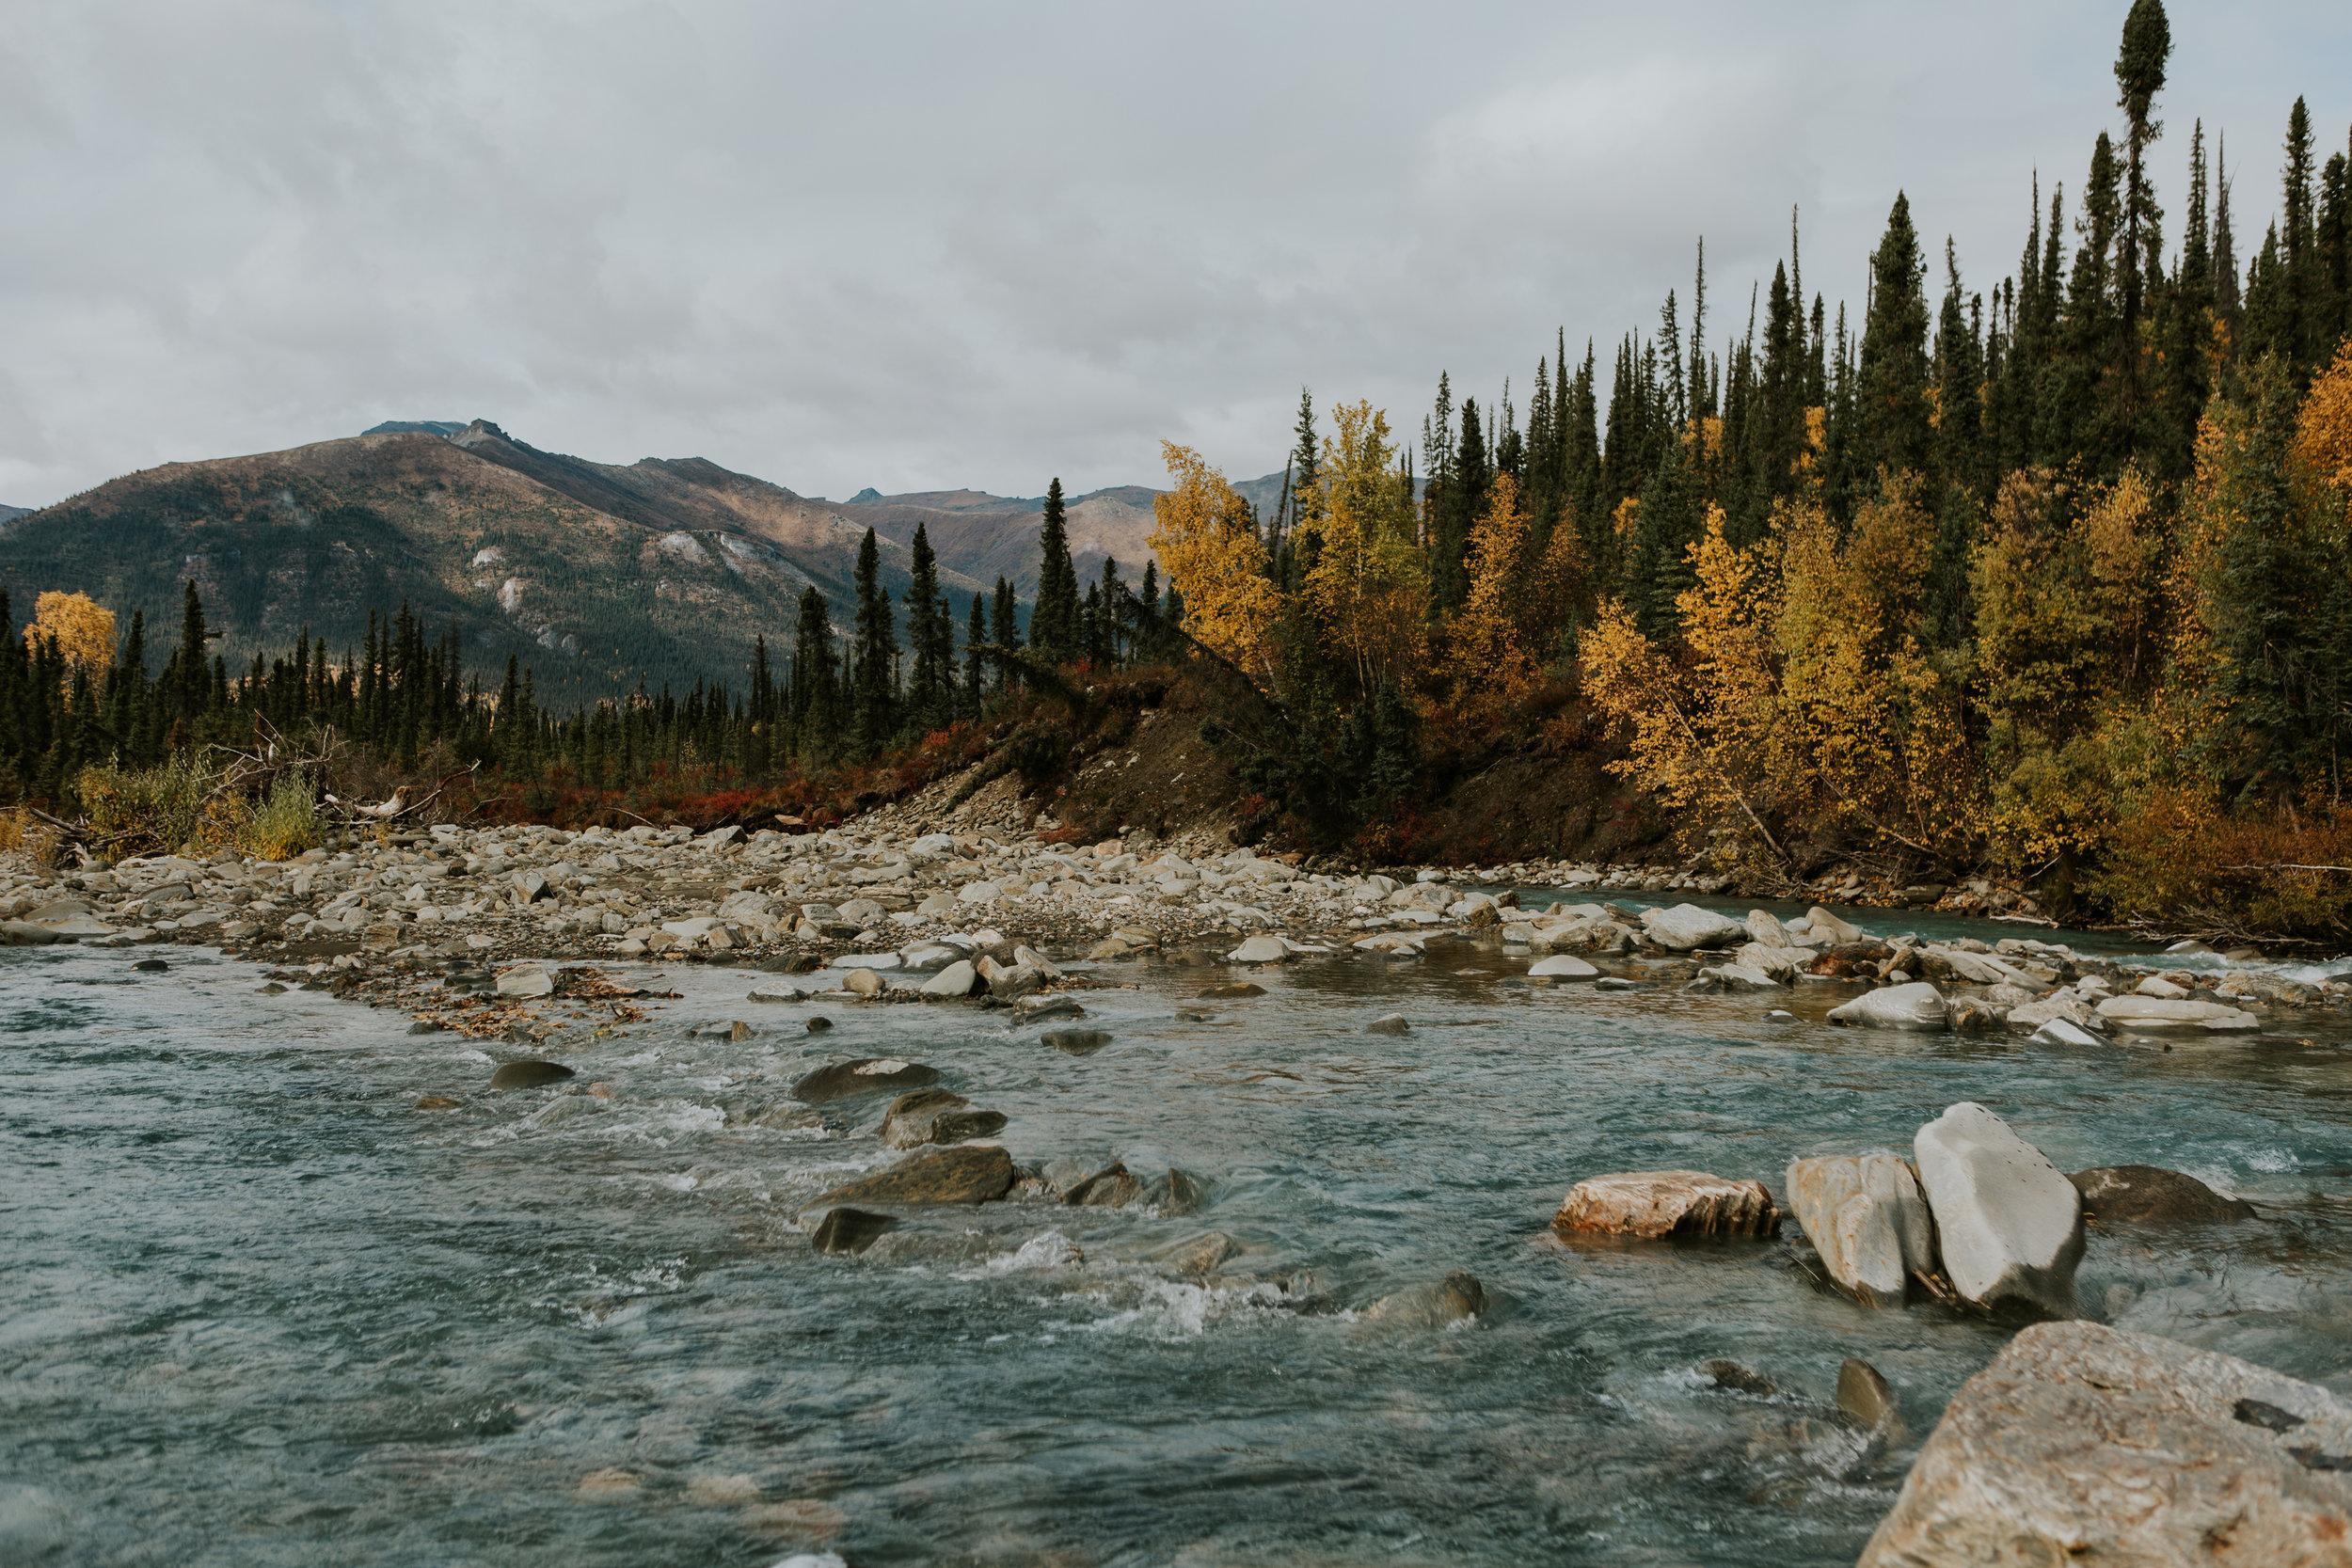 CindyGiovagnoli_Alaska_KoyukukRiver_SukakpakMountain_JimRiver_ArcticCircle_fly_fishing_September-043.jpg